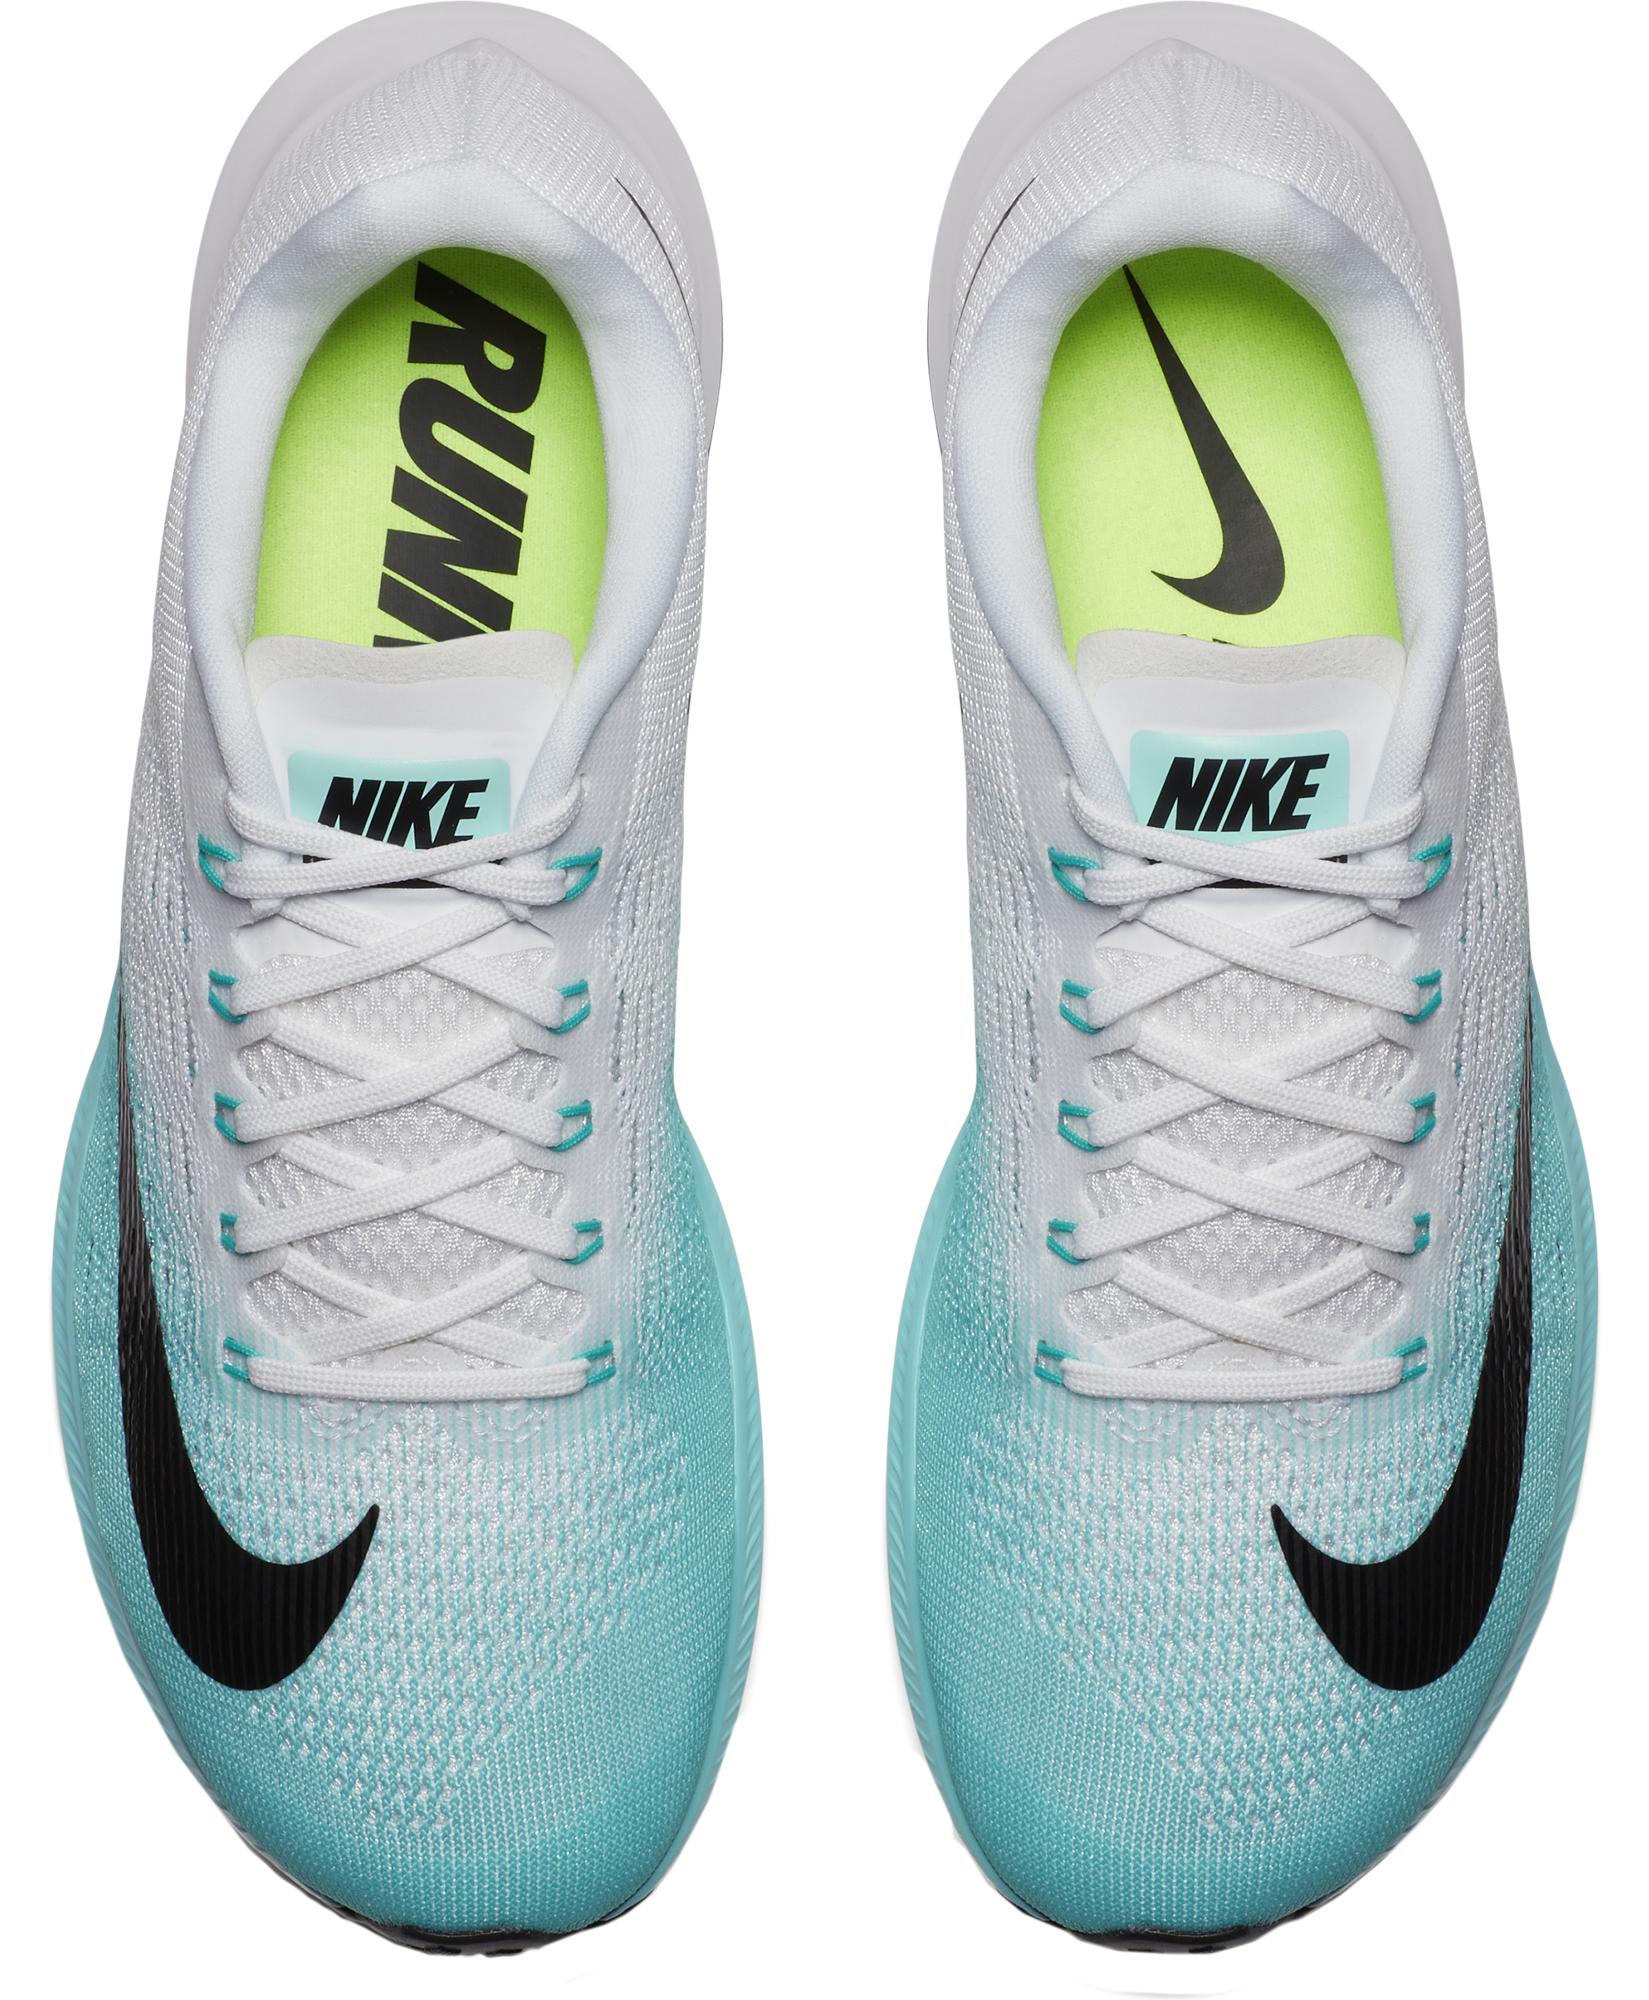 a6045aead25 Nike Air Zoom Elite 9 Road Running Shoes - Women s